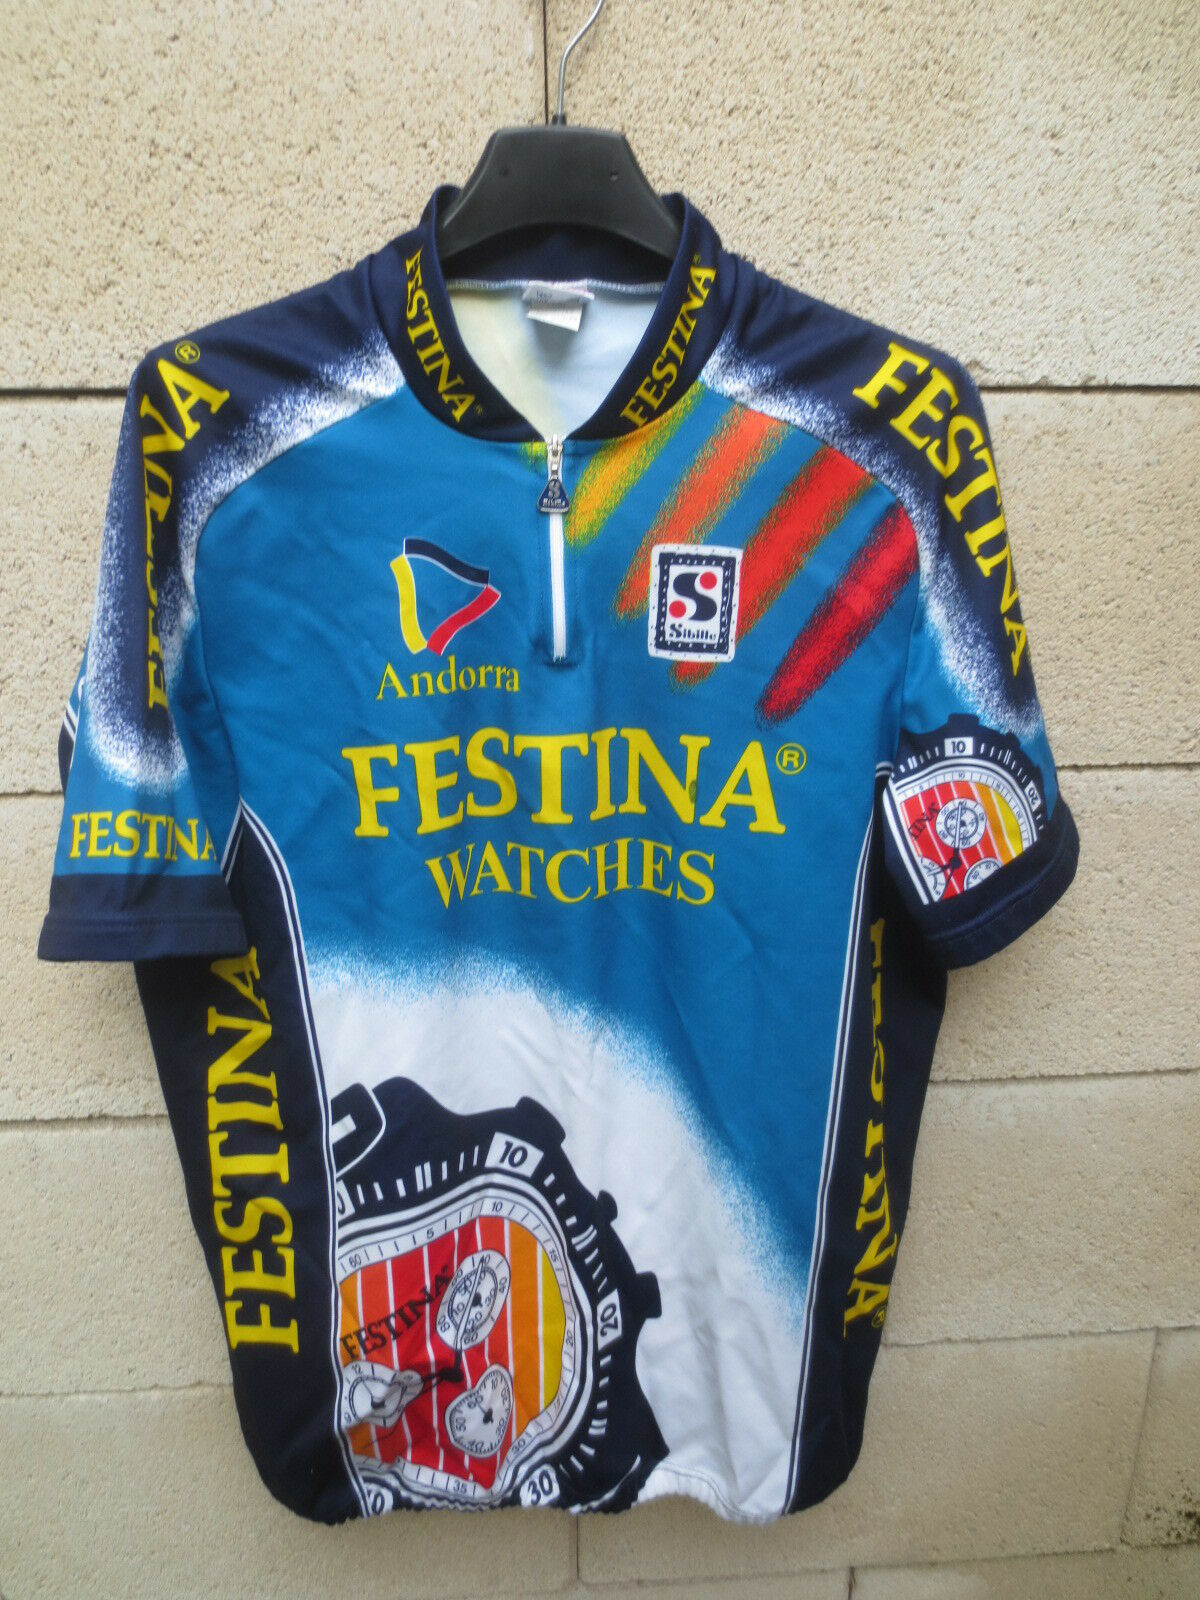 Maillot cycliste FESTINA ANDORRA Tour de France 1994 LEwhite VIRENQUE shirt XXL